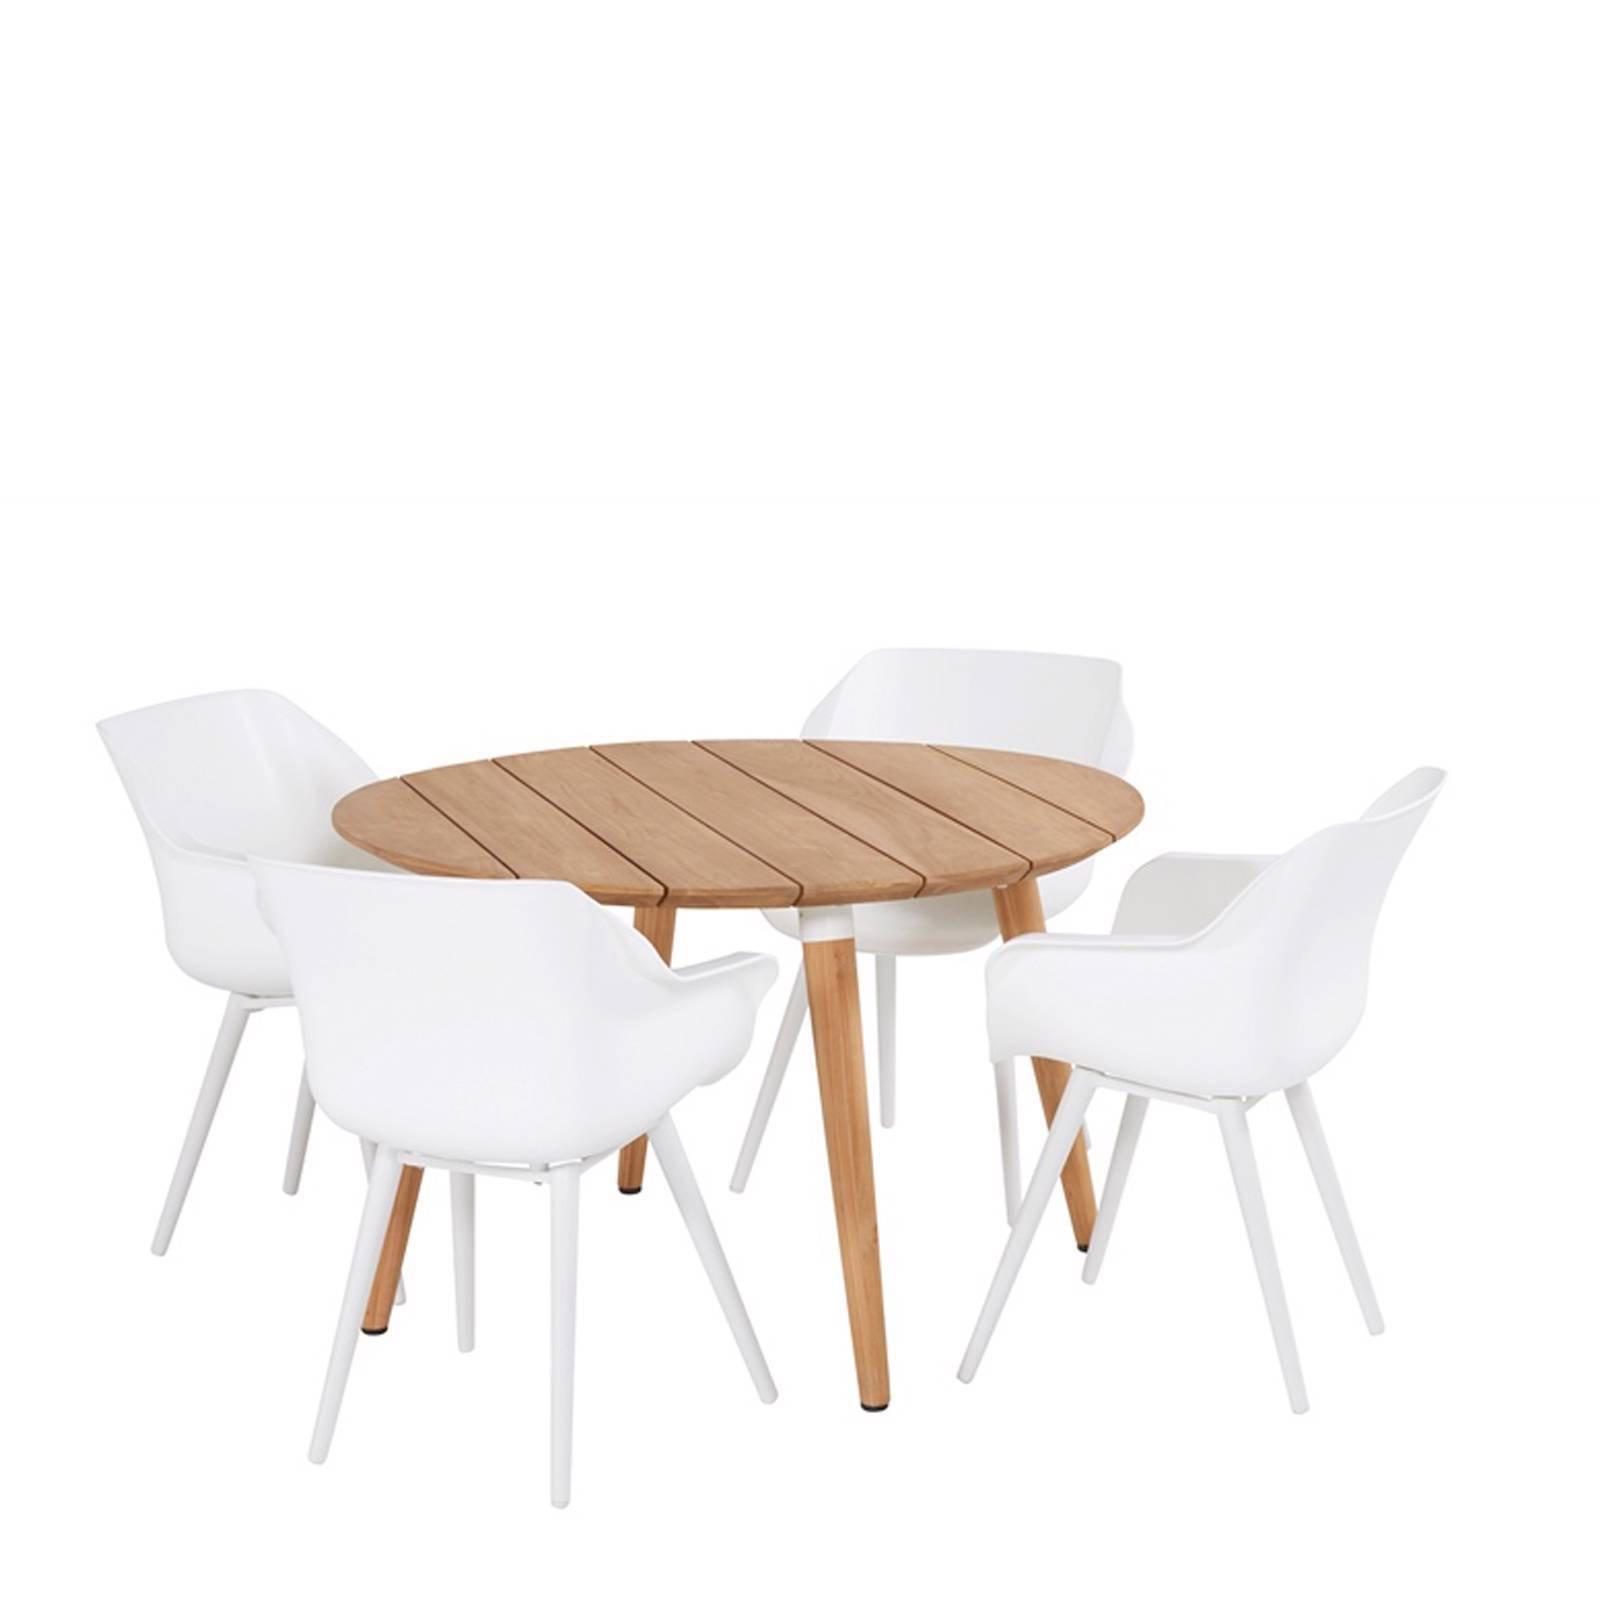 Ronde Tuintafel Hardhout.Ronde Tuintafel Sophie Studio O120 Cm